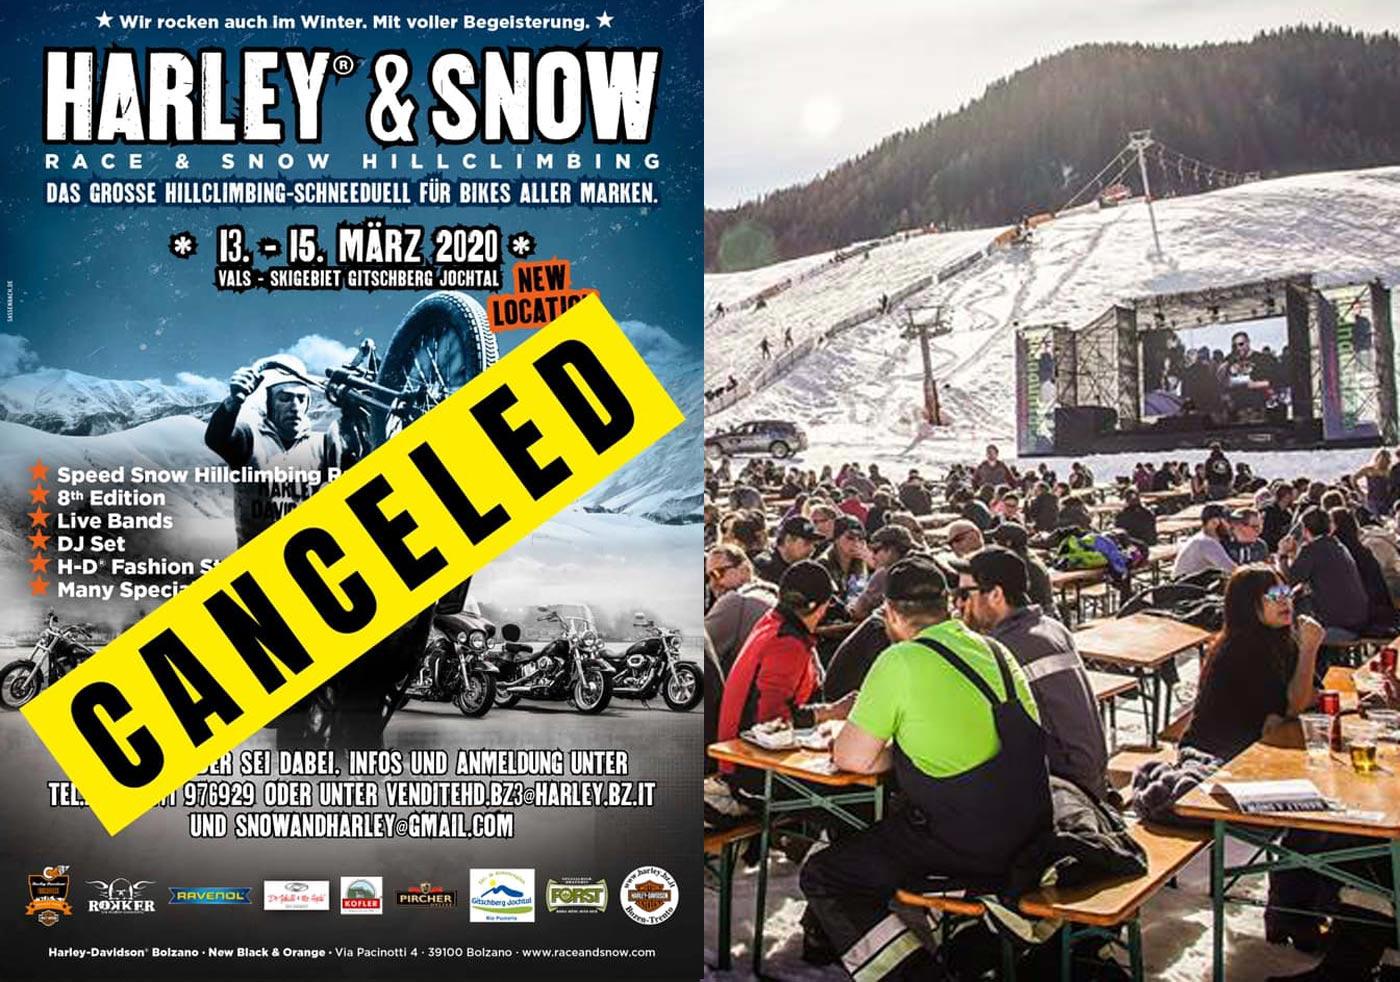 Corona Virus - Harley And Snow 2020 ABSAGE